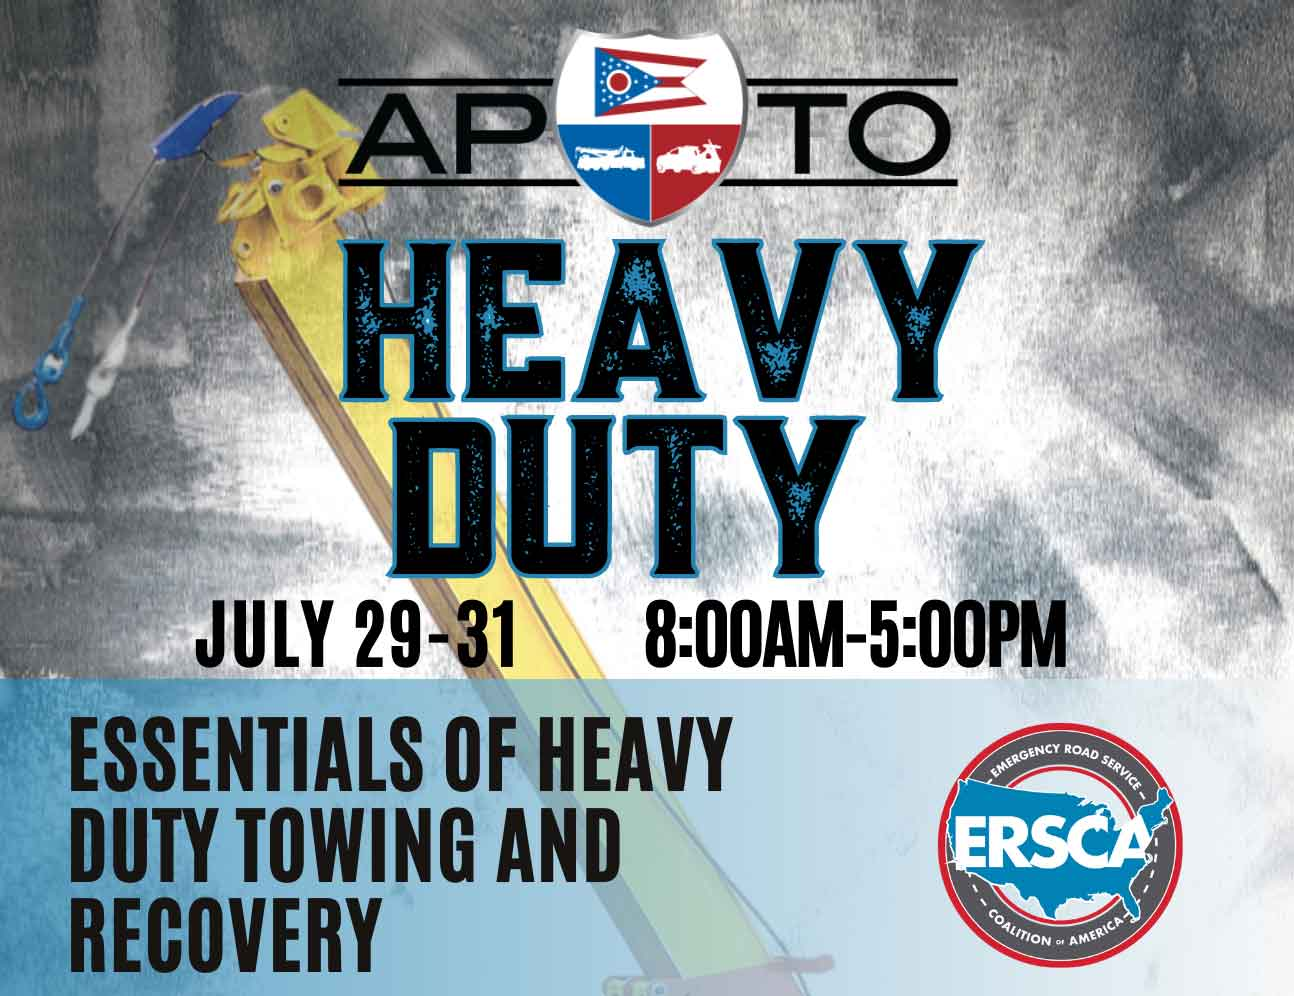 APTO/ERSCA Heavy-Duty Training Event